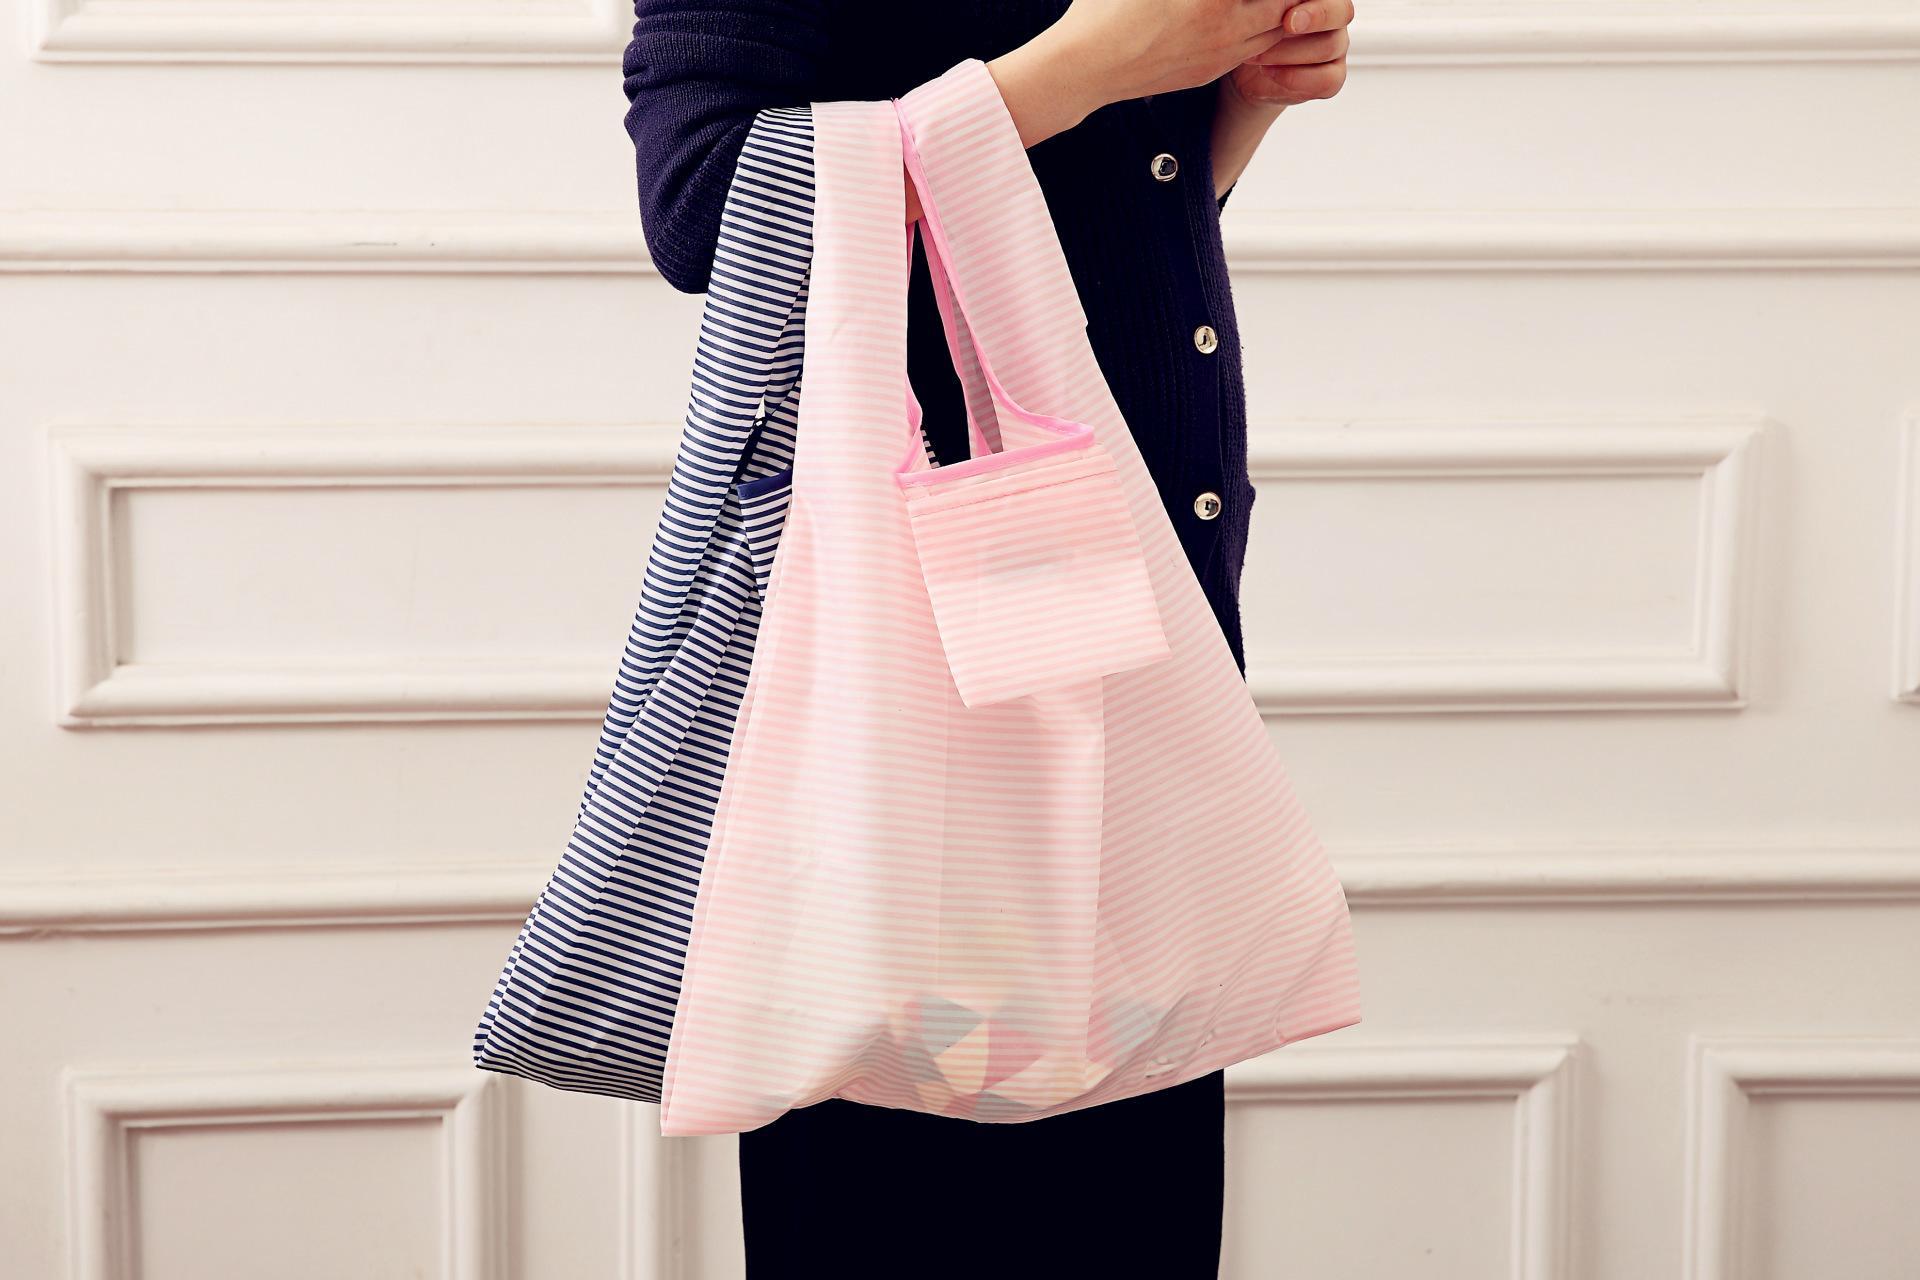 Portable Supermarket Folding Shopping Bag Household Nylon Storage Bag Handbag Folding Bag Gift Giveaway Printed LOGO